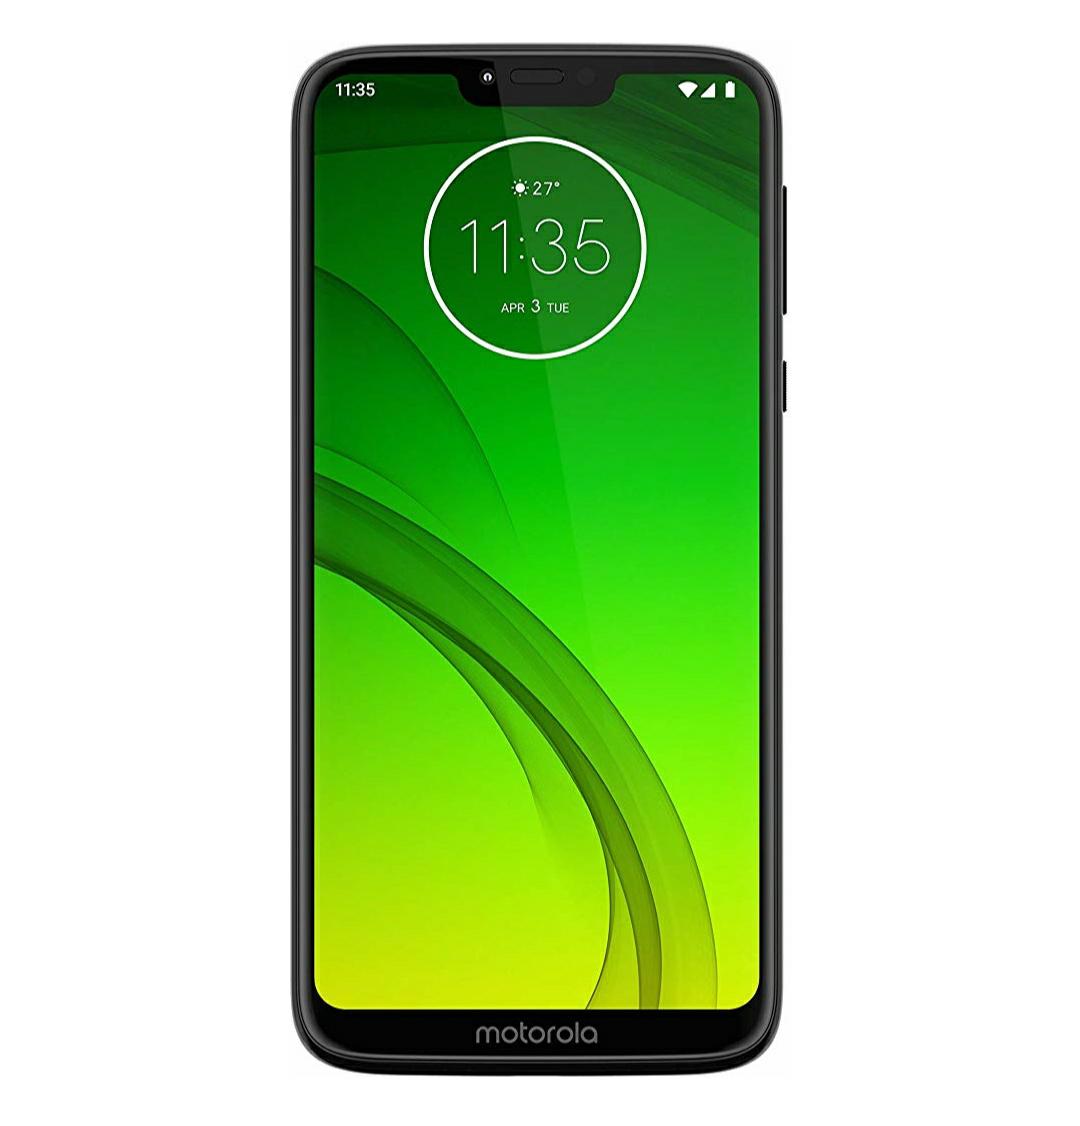 Motorola Moto G7 Power 6.2-Inch Android 9.0 Pie UK Sim-Free Smartphone with 4GB RAM and 64GB Storage (Single Sim) – Black £179 @ Amazon